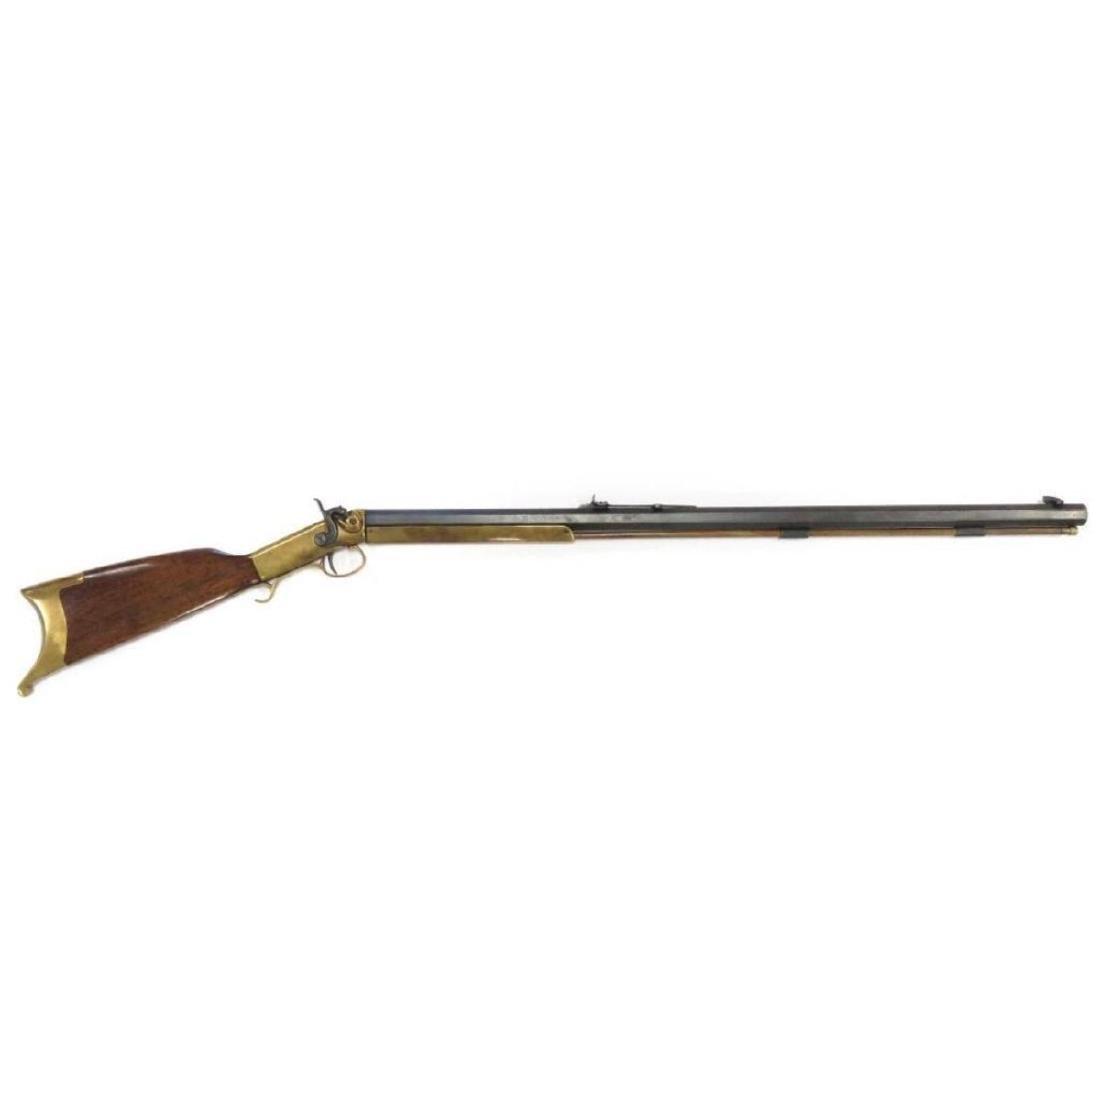 1850's Mowrey .58 Cal Black Powder Percussion Musket